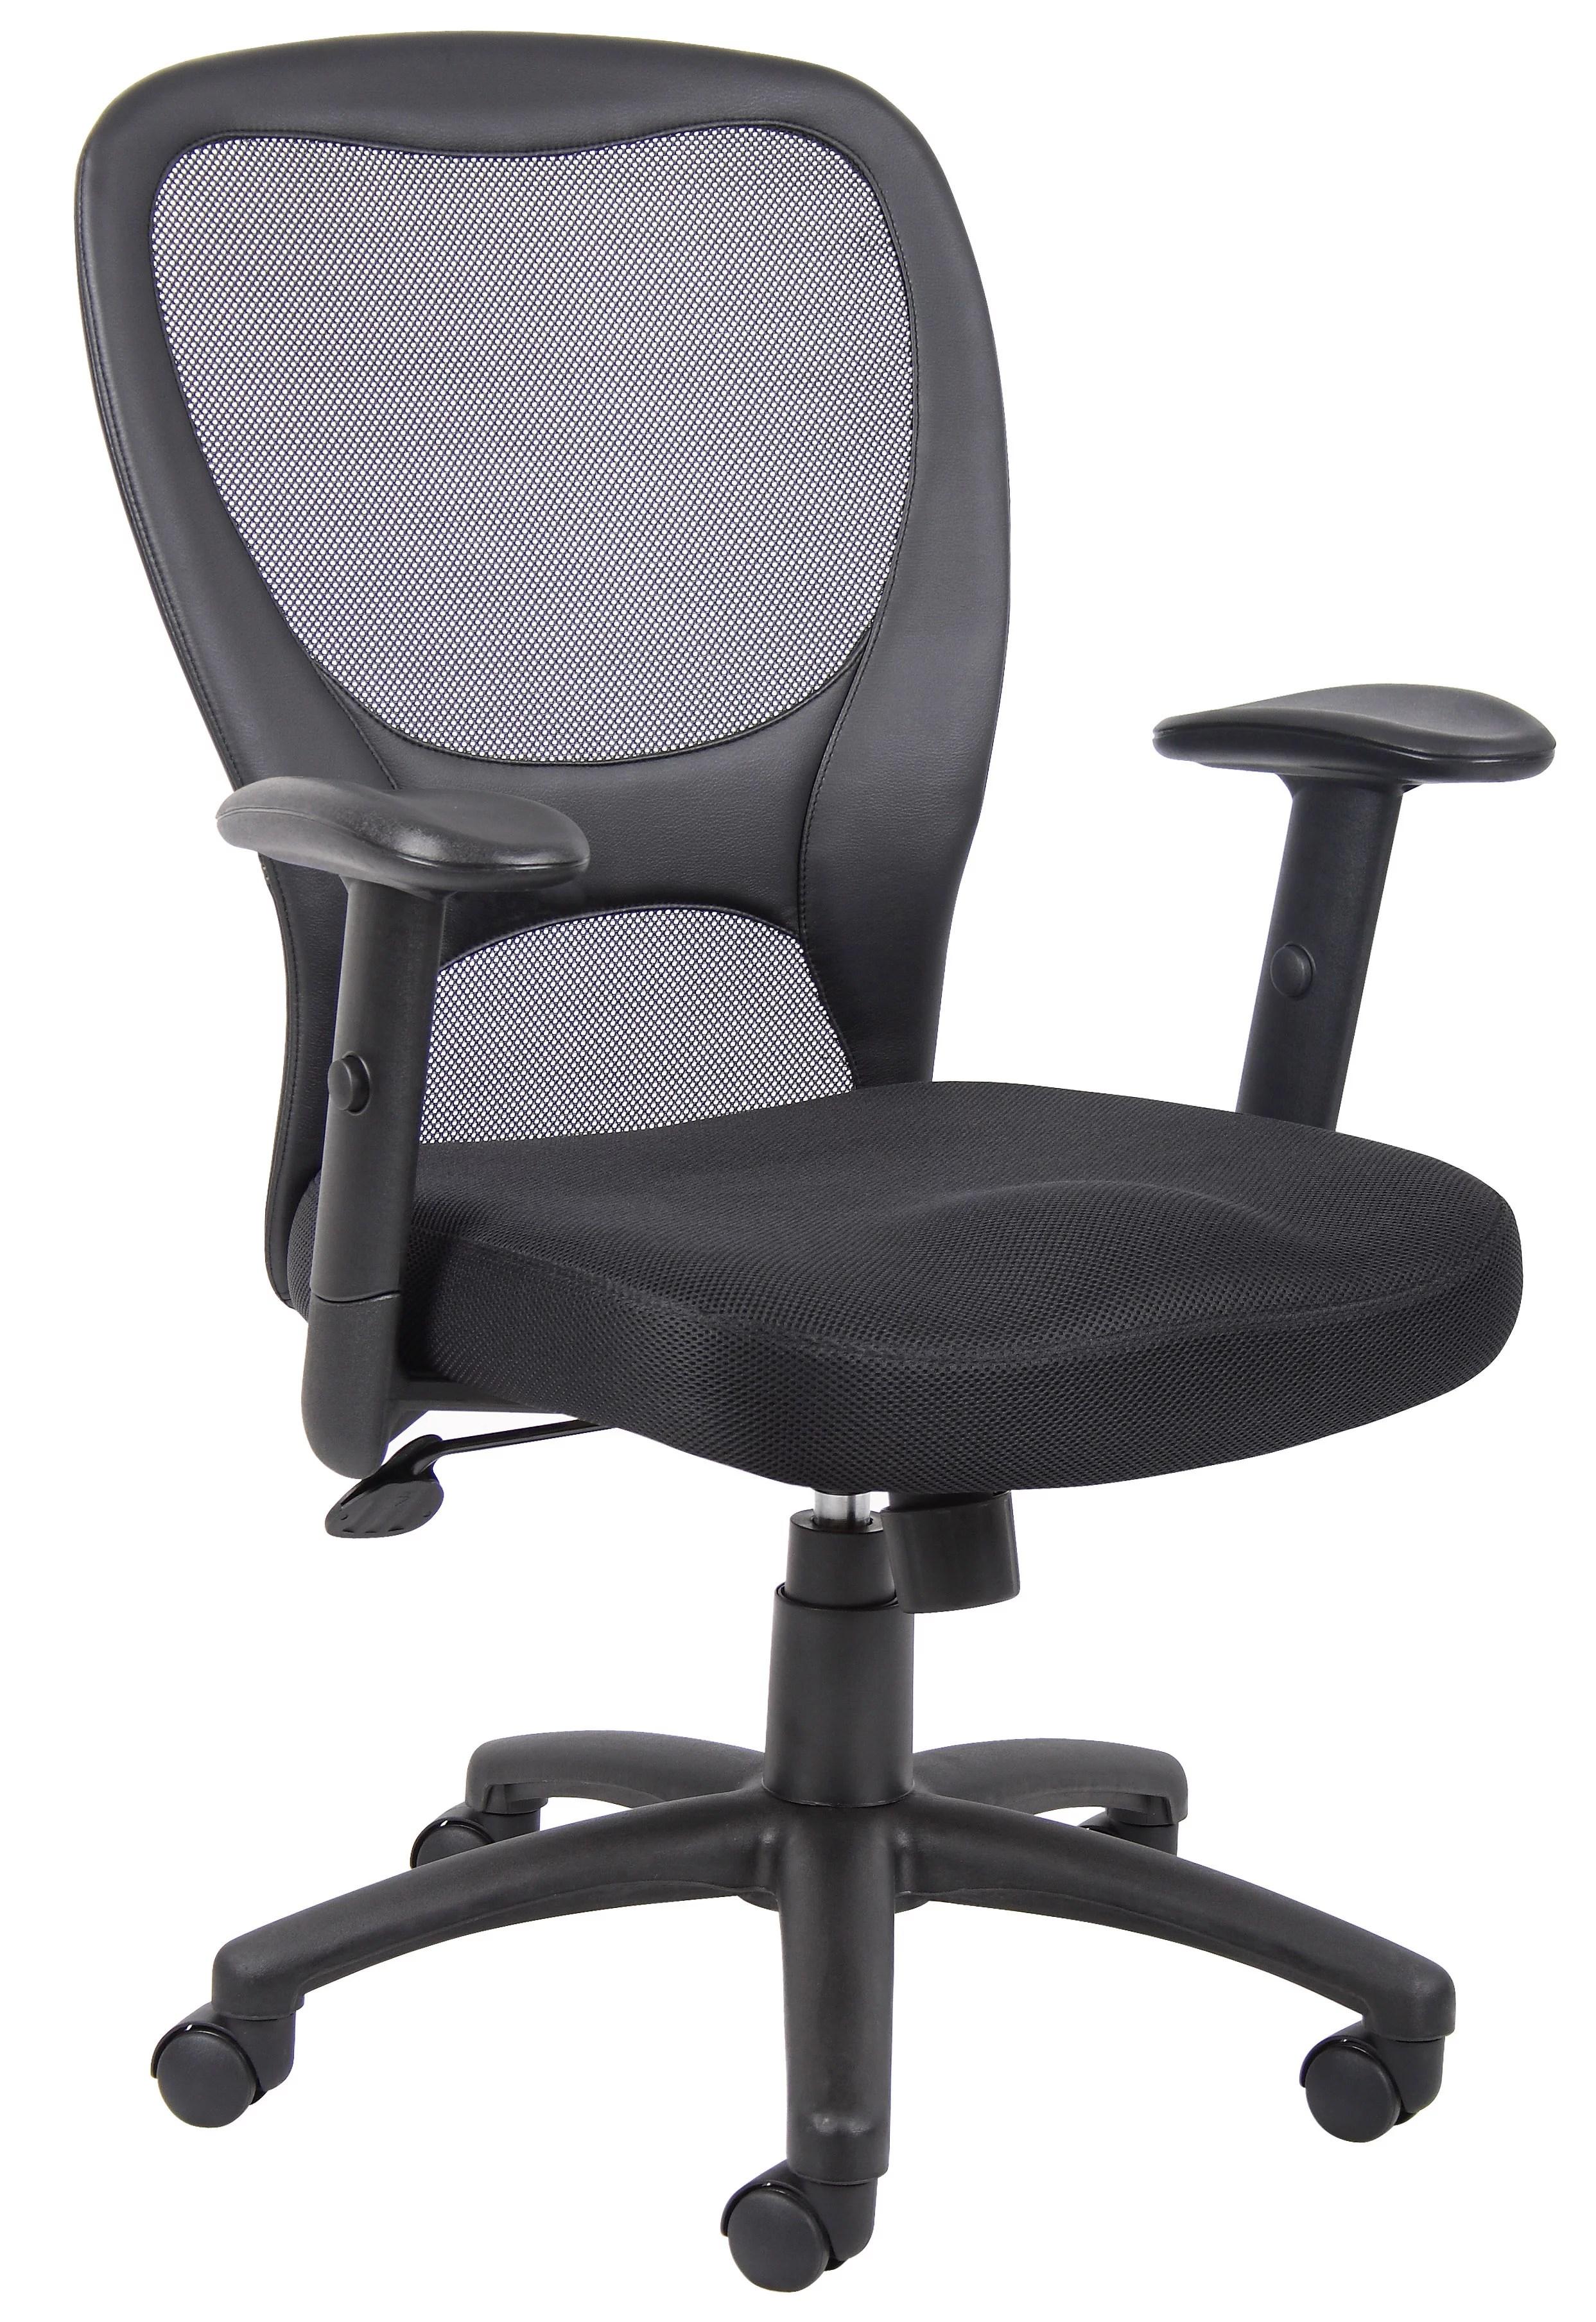 mesh task chair coleman camp chairs boss office home budget walmart com